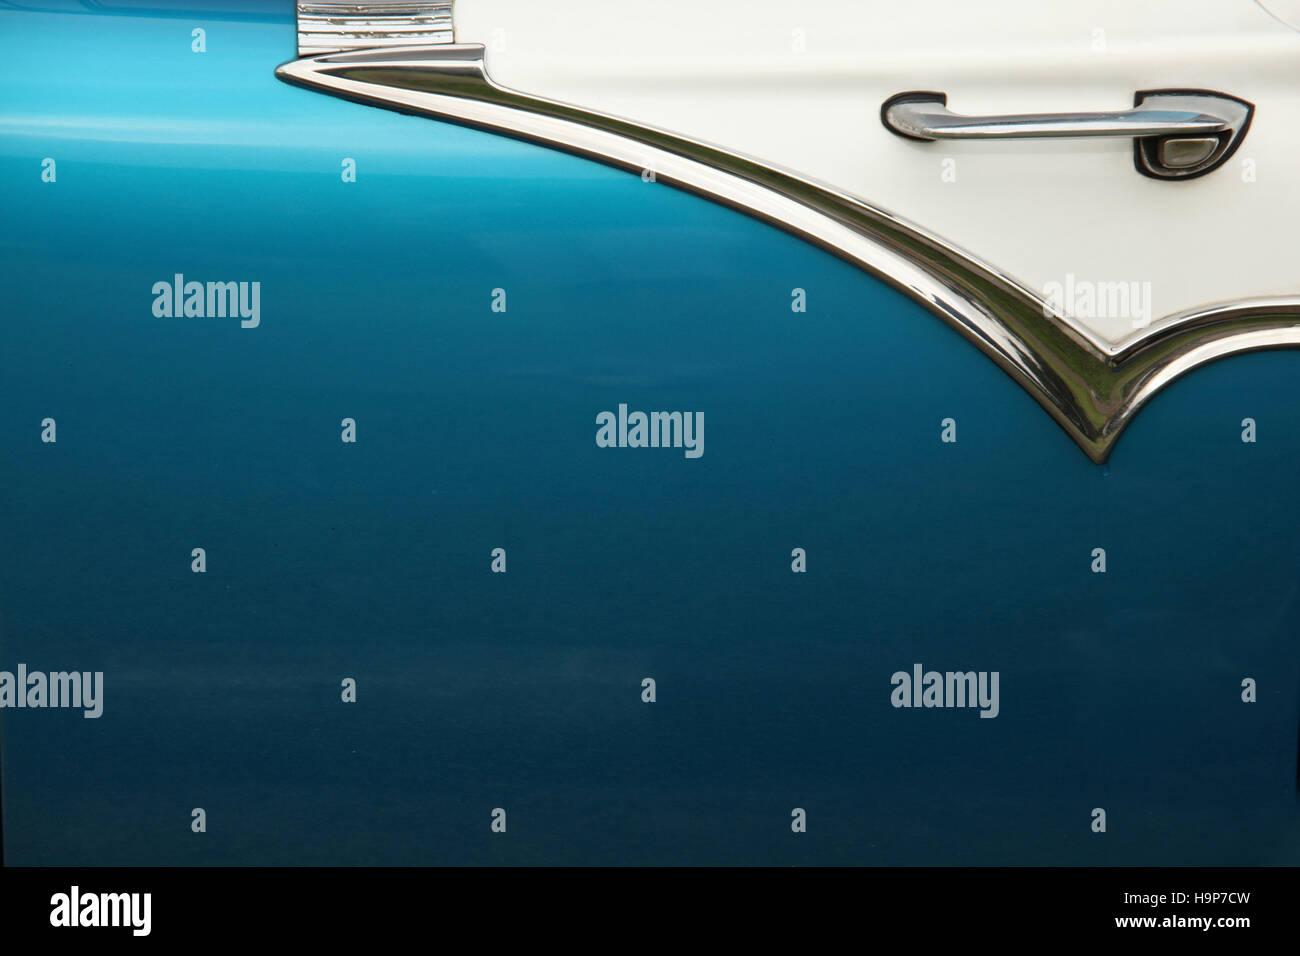 Close up of a blue door of a 1950's classic car, in Havana, Cuba, Caribbean. - Stock Image